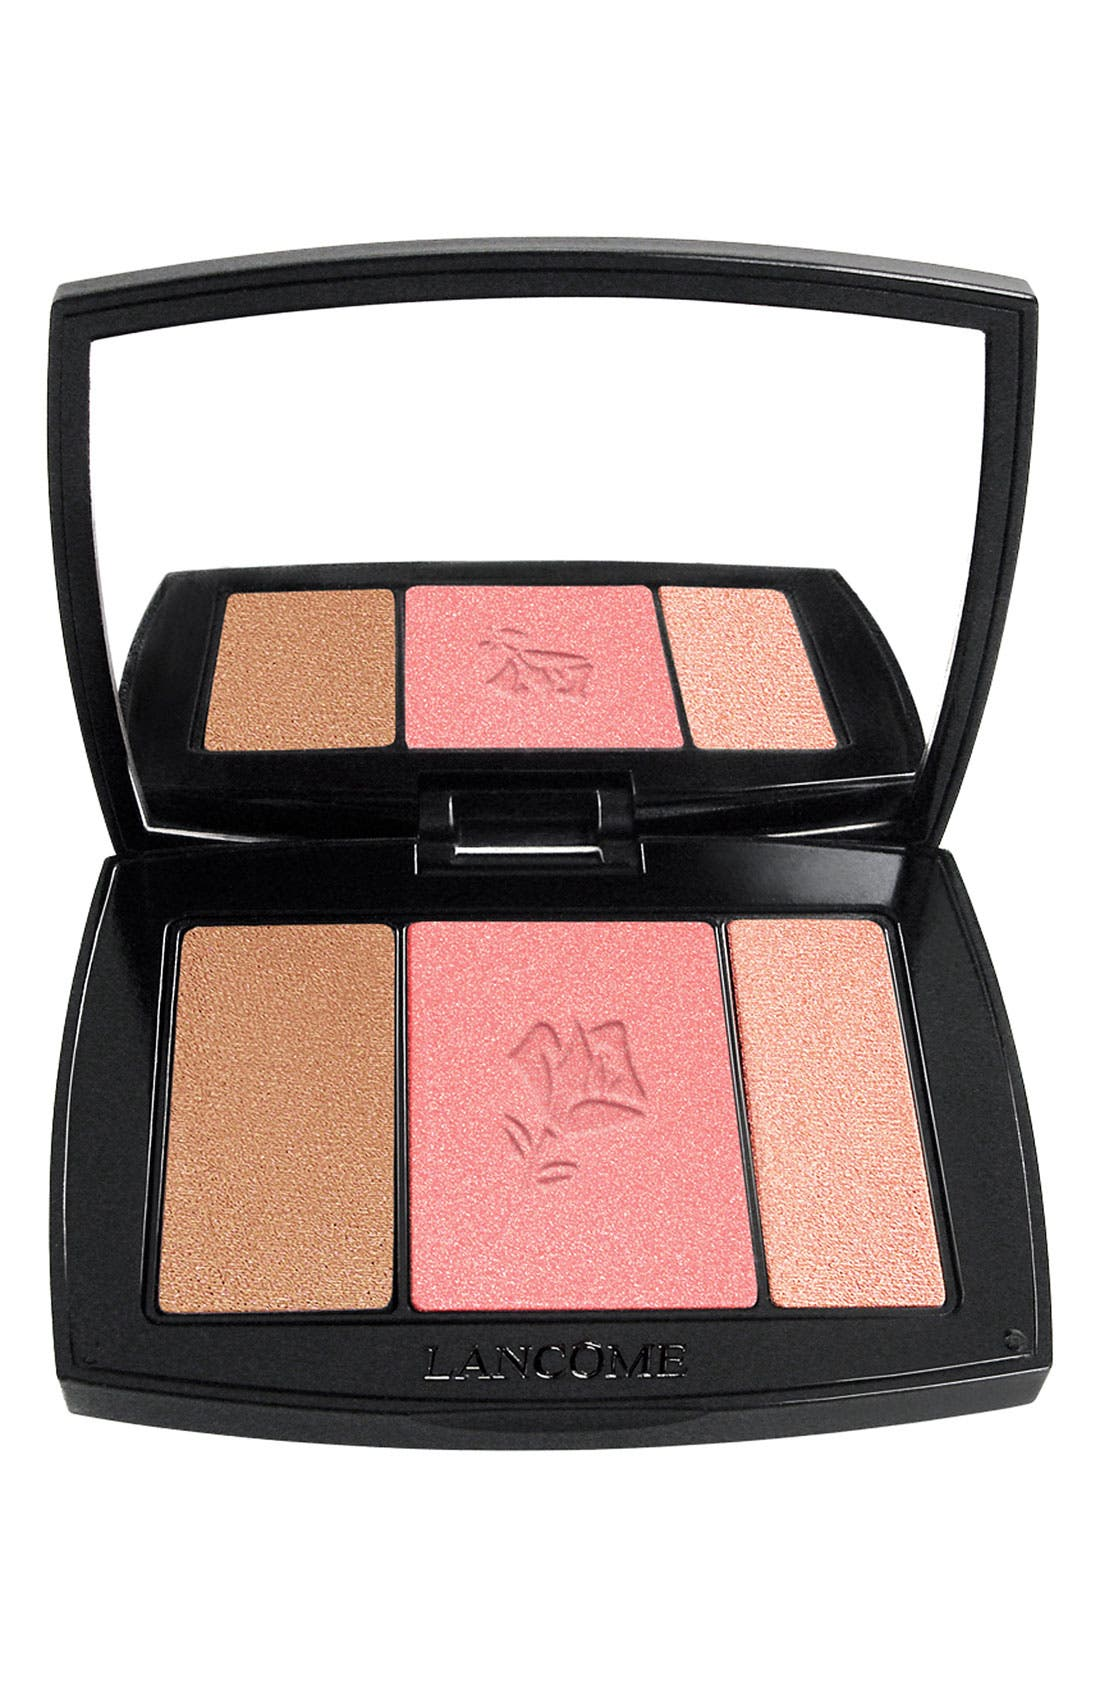 Blush Subtil All-In-One Contour, Blush & Highlighter Palette,                         Main,                         color, 323 ROSE FLUSH